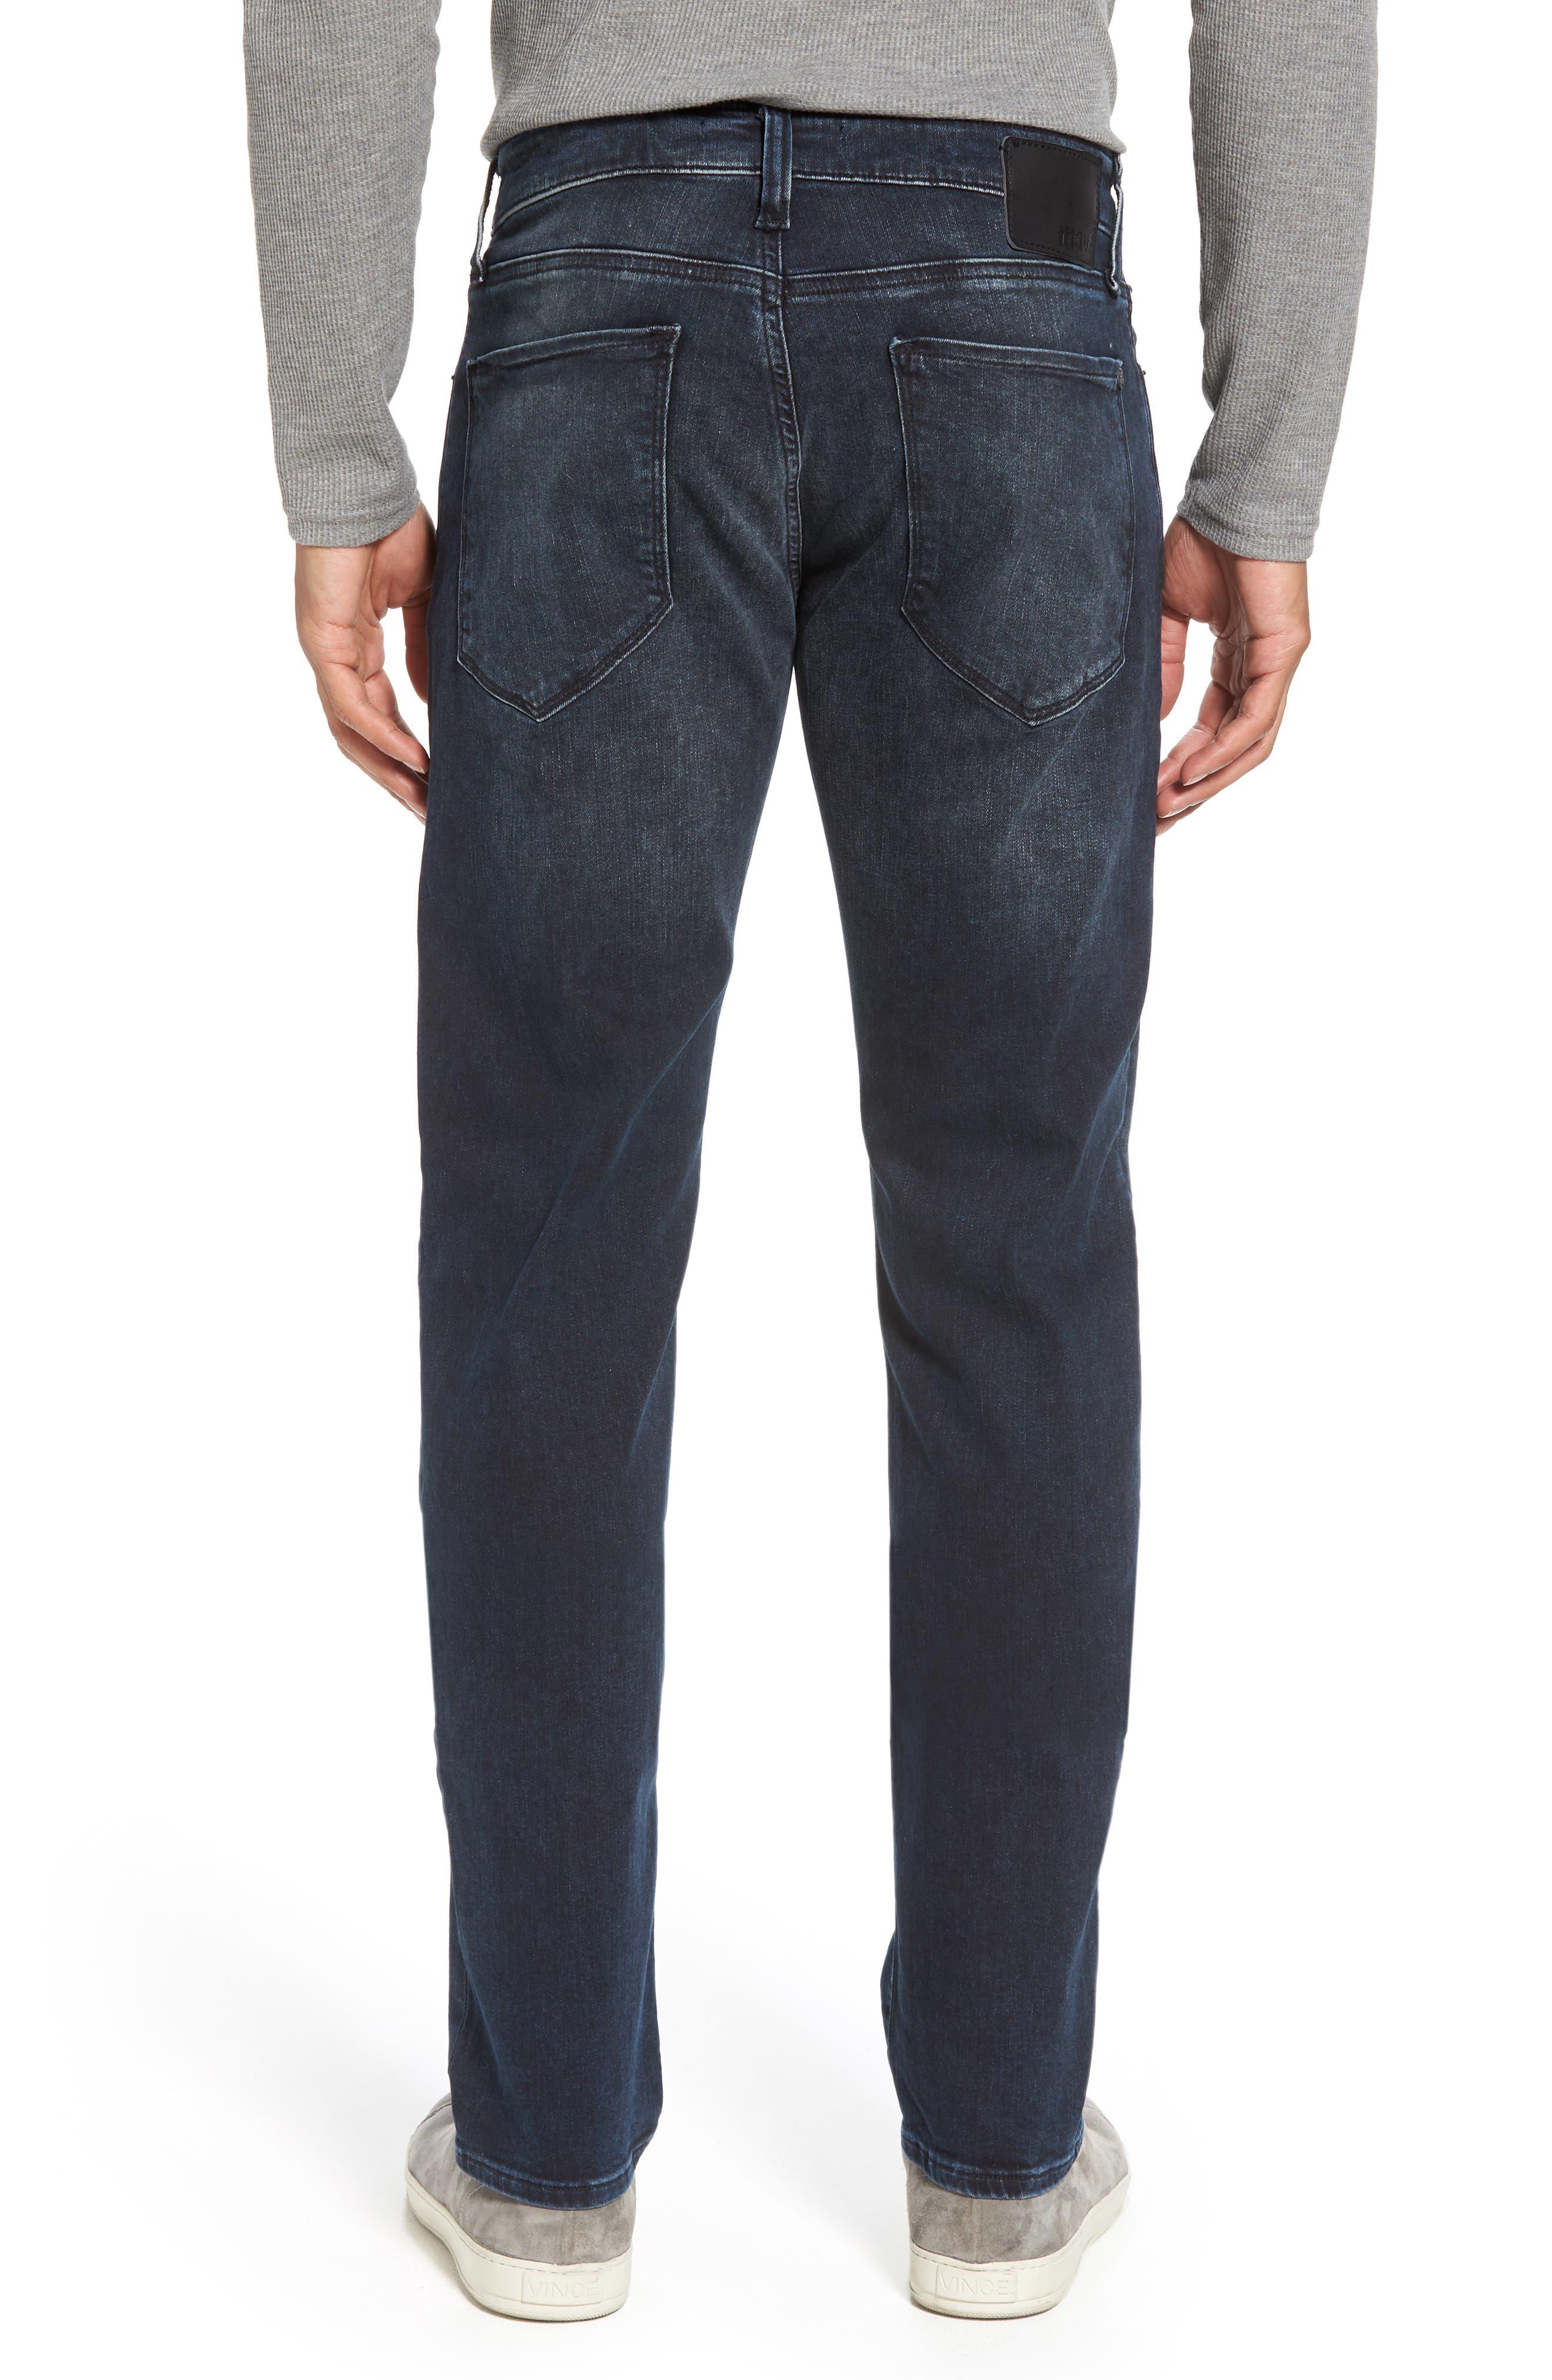 Jake Slim Fit Jeans,                             Alternate thumbnail 2, color,                             401